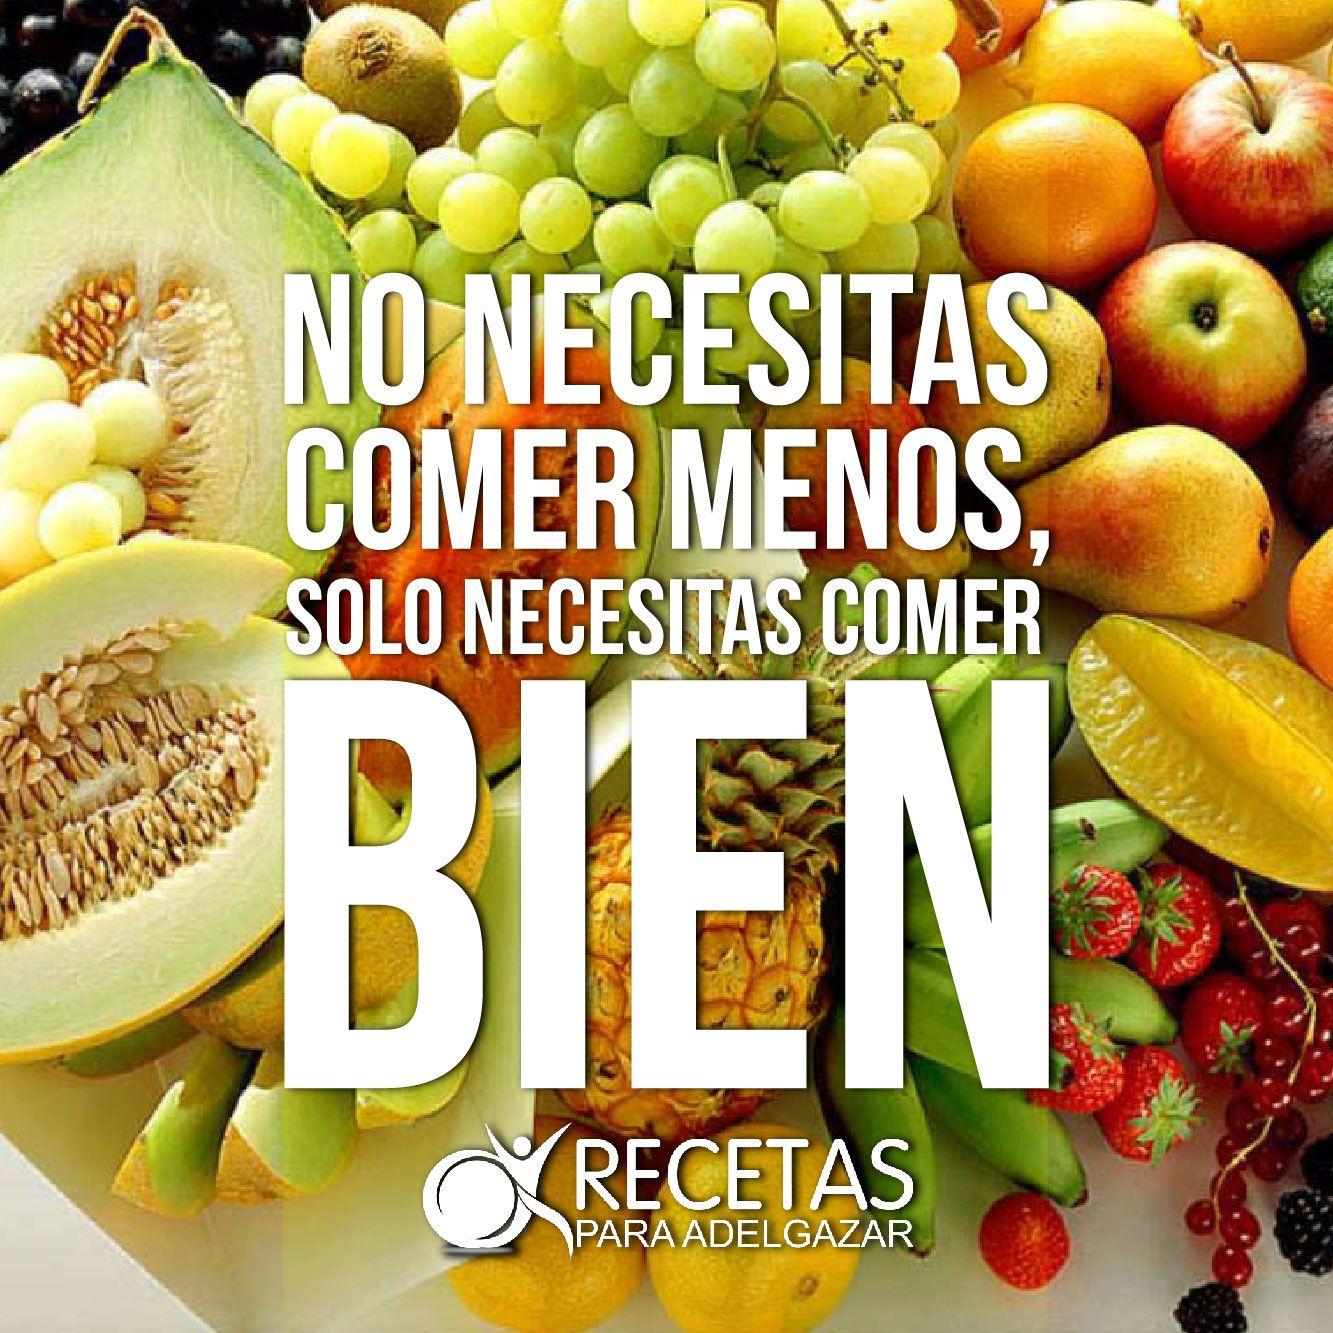 Solo Necesitas Comer Bien Frase Nutrilife Pinterest Comer  ~ Aprender A Comer Bien Para Adelgazar